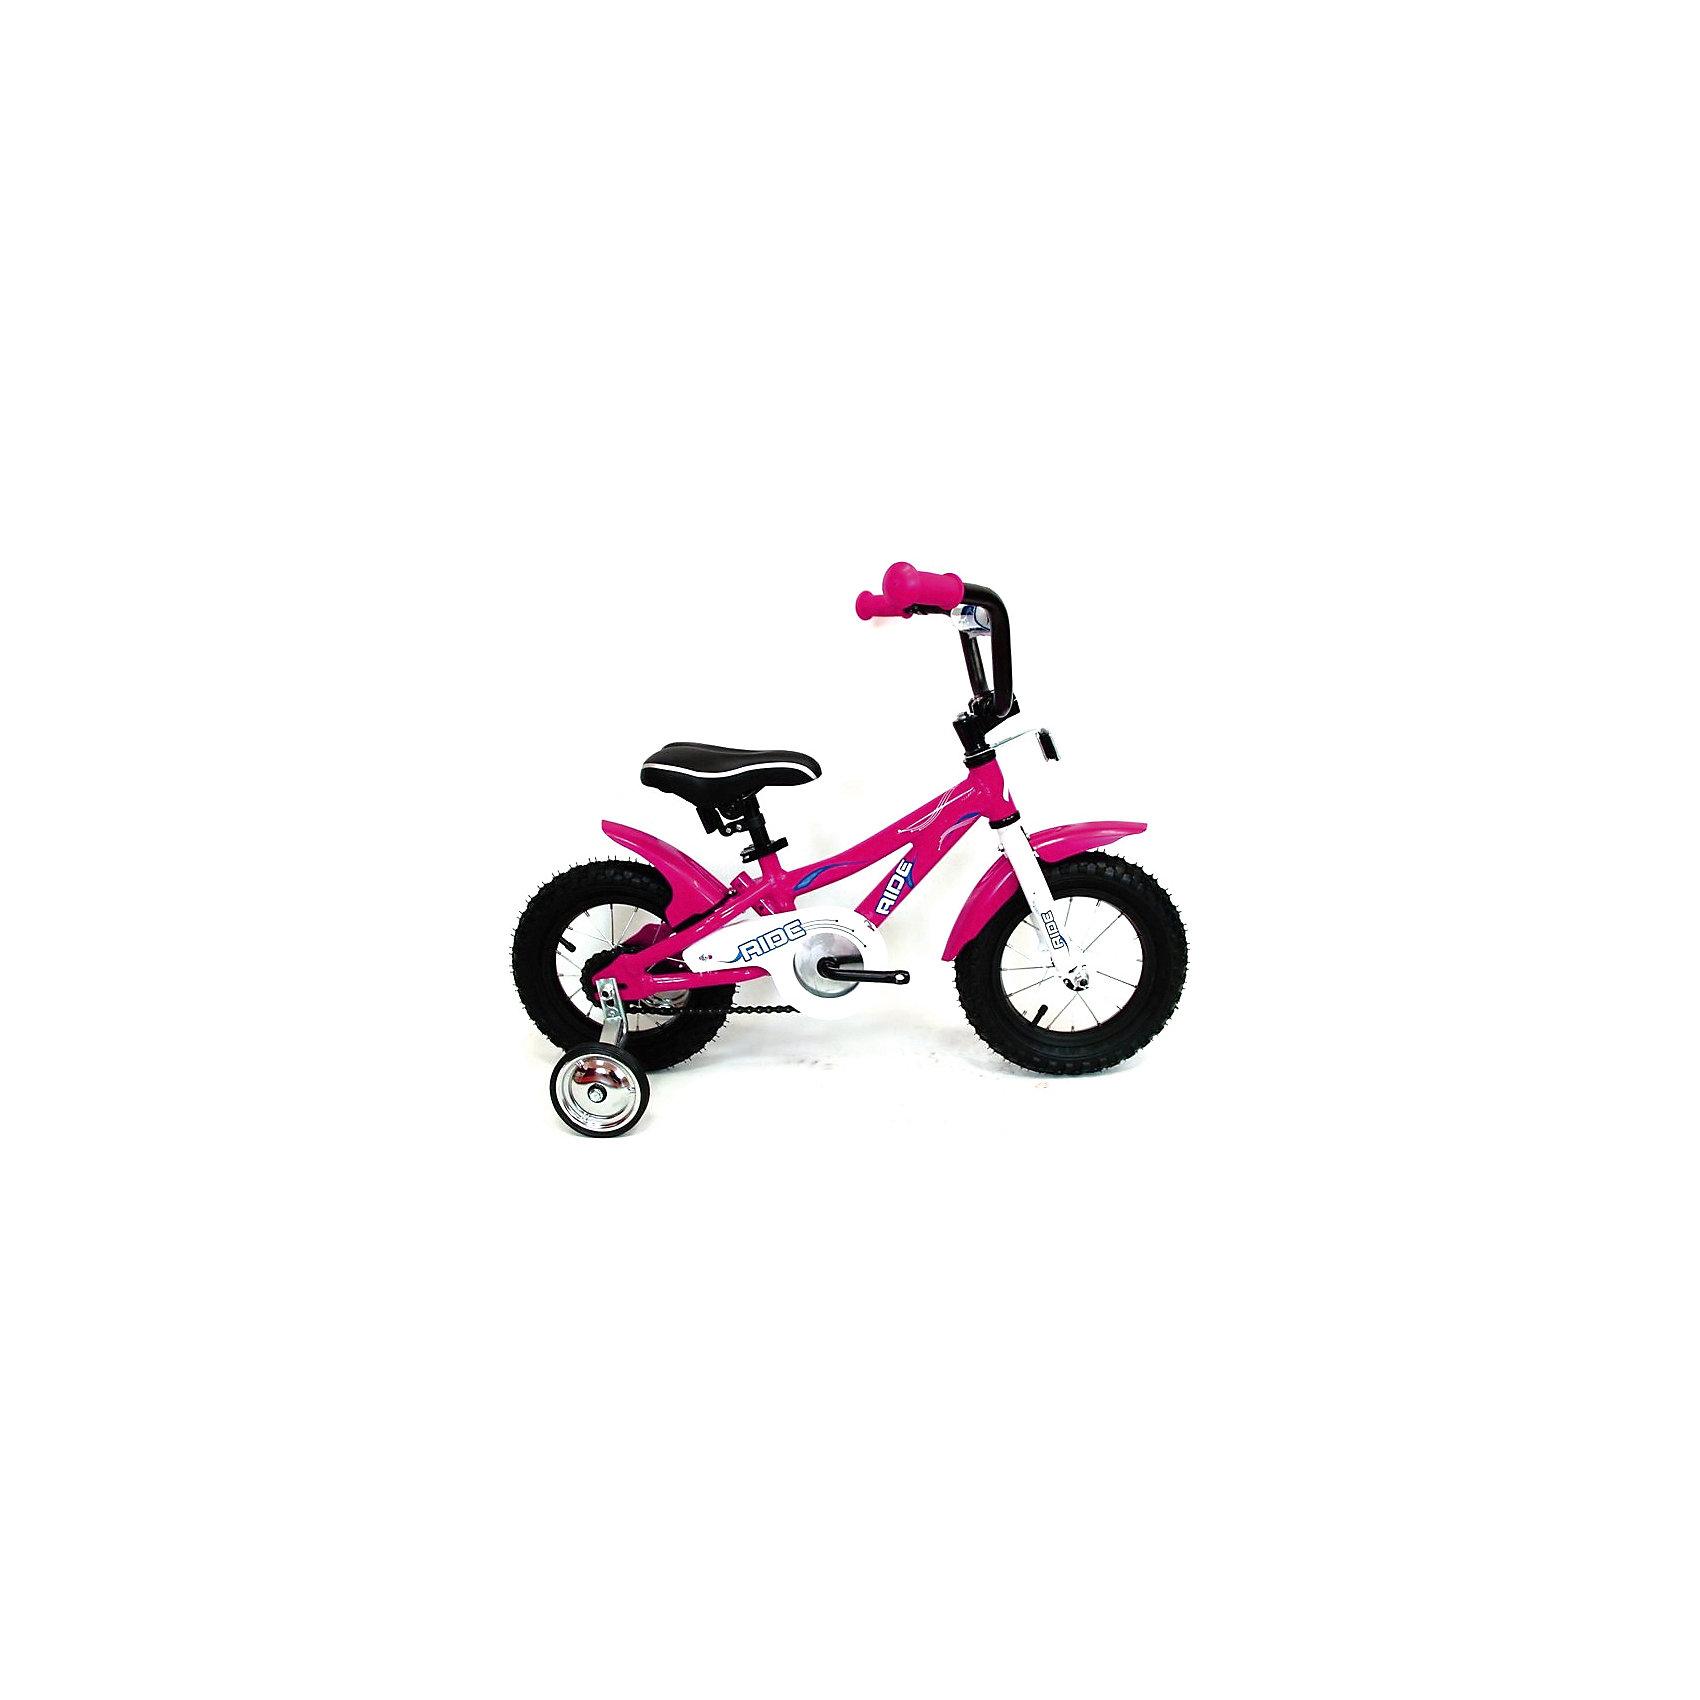 Велосипед RIDE, MARS, темно-розовый<br><br>Ширина мм: 400<br>Глубина мм: 400<br>Высота мм: 1000<br>Вес г: 10000<br>Возраст от месяцев: 24<br>Возраст до месяцев: 60<br>Пол: Унисекс<br>Возраст: Детский<br>SKU: 4785497